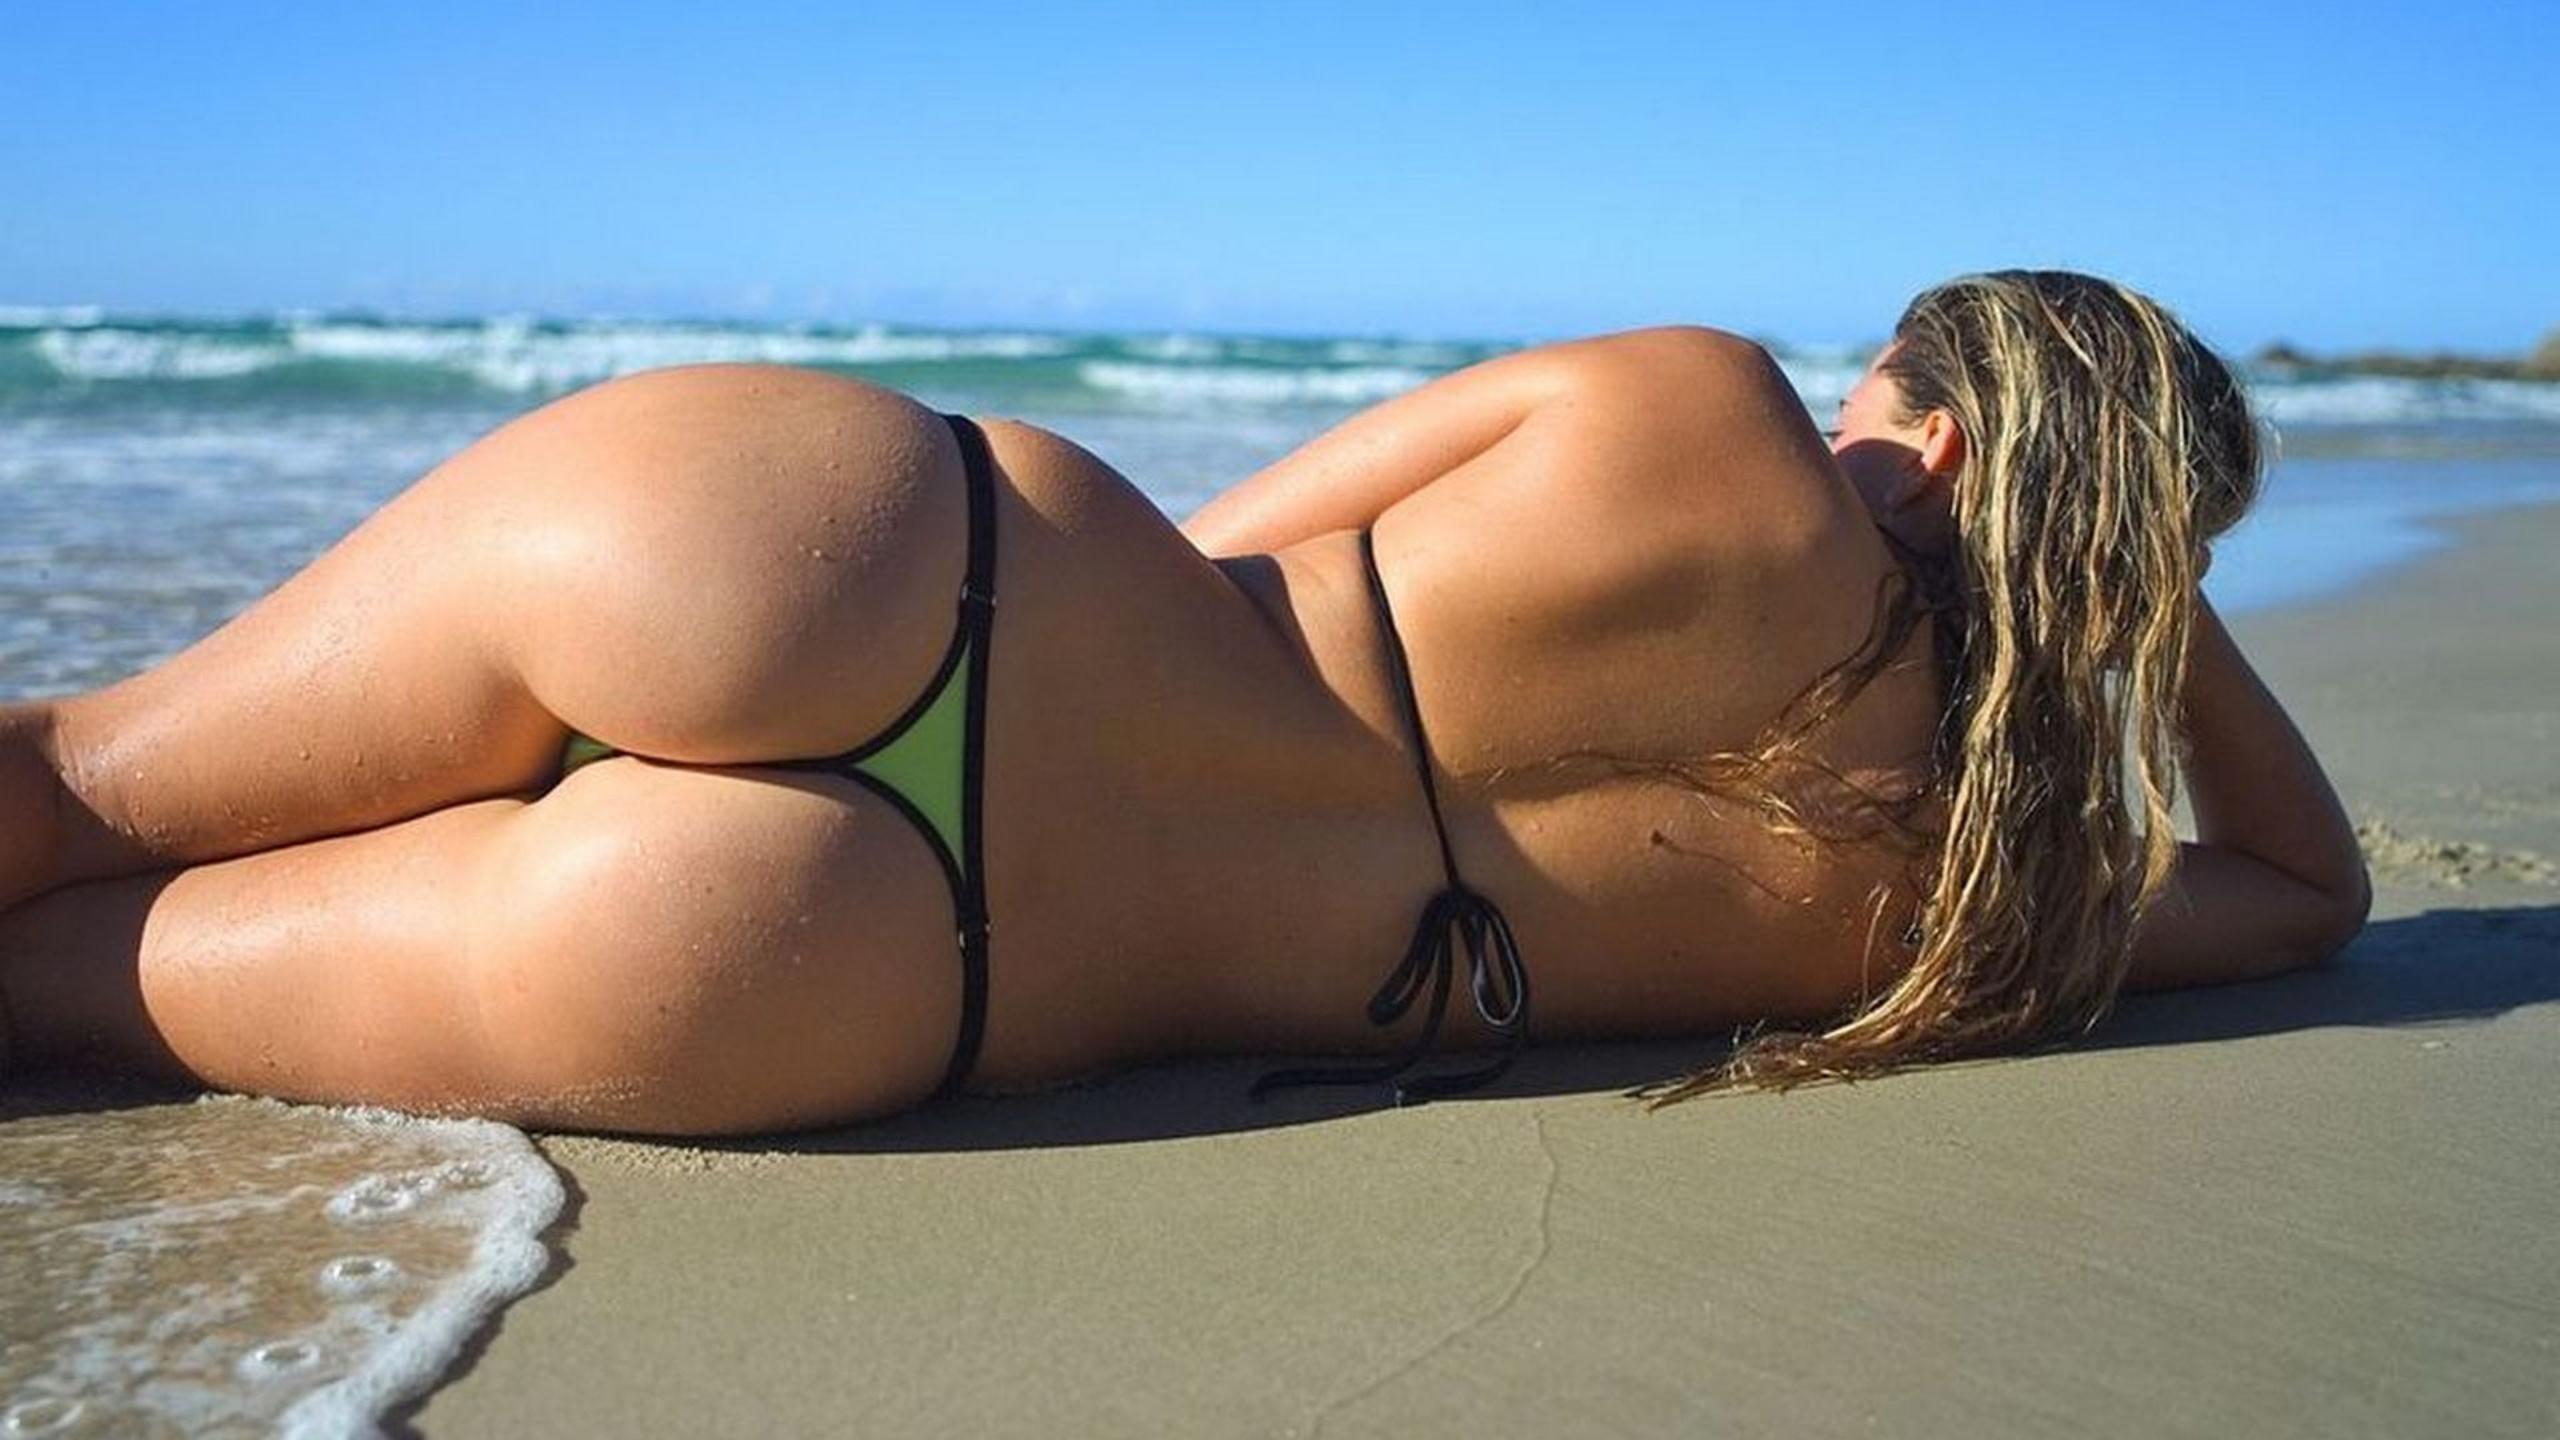 packer-bikini-girls-pics-nude-girs-pussy-pic